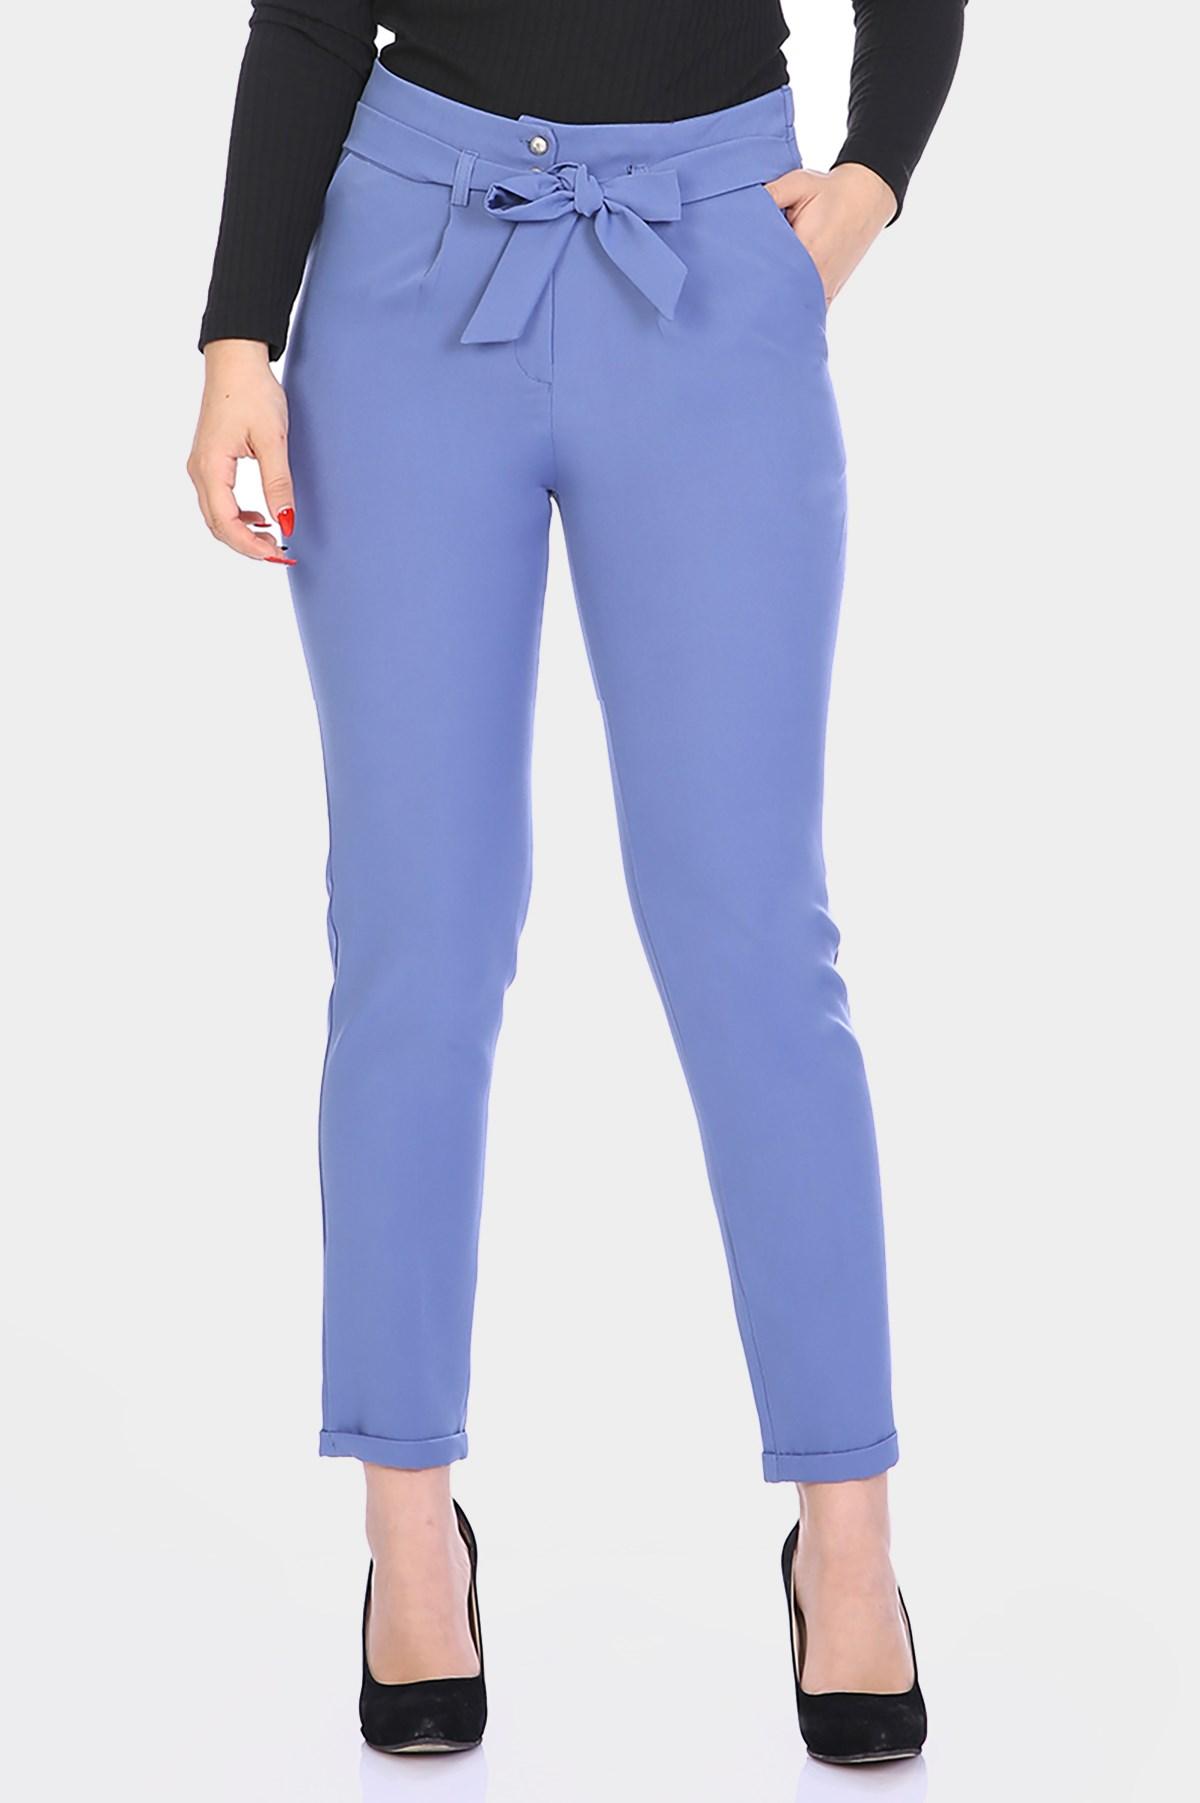 Women's Pocket Skinny Pants